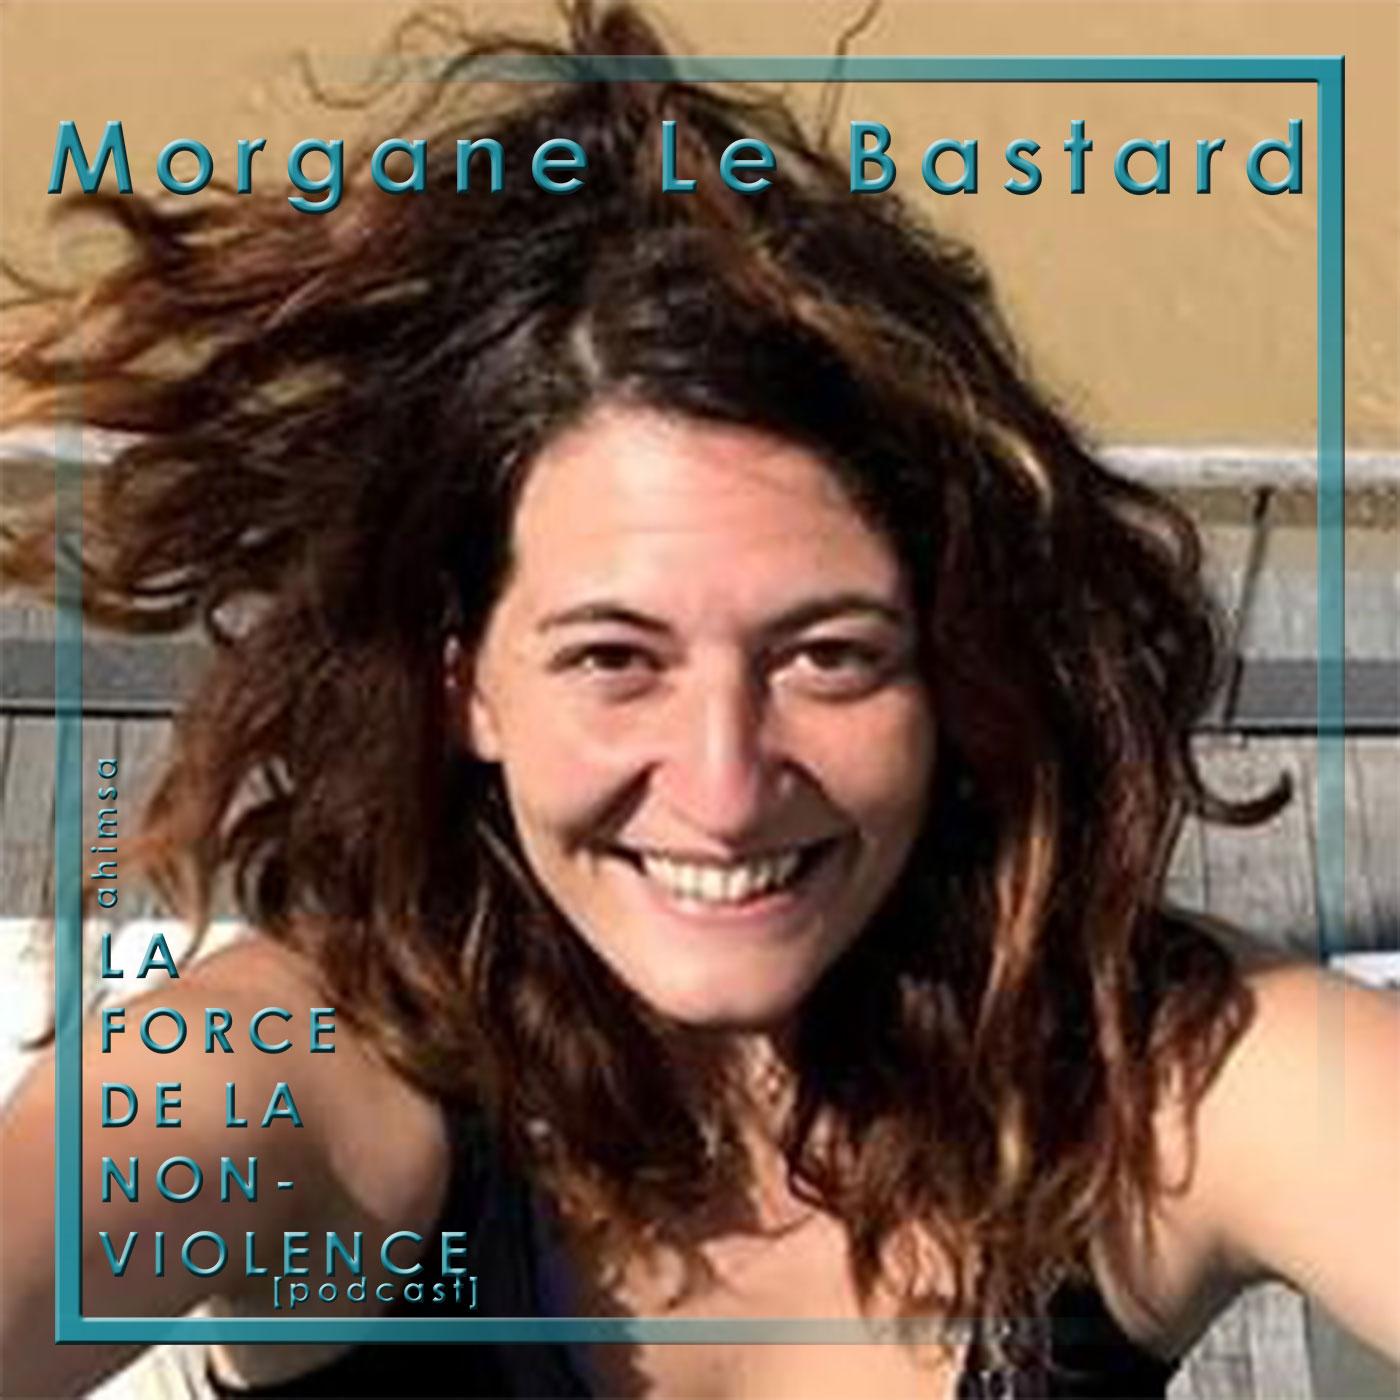 Morgane Le Bastard - Greenpeace - La ForcedelaNonviolence - Podcast